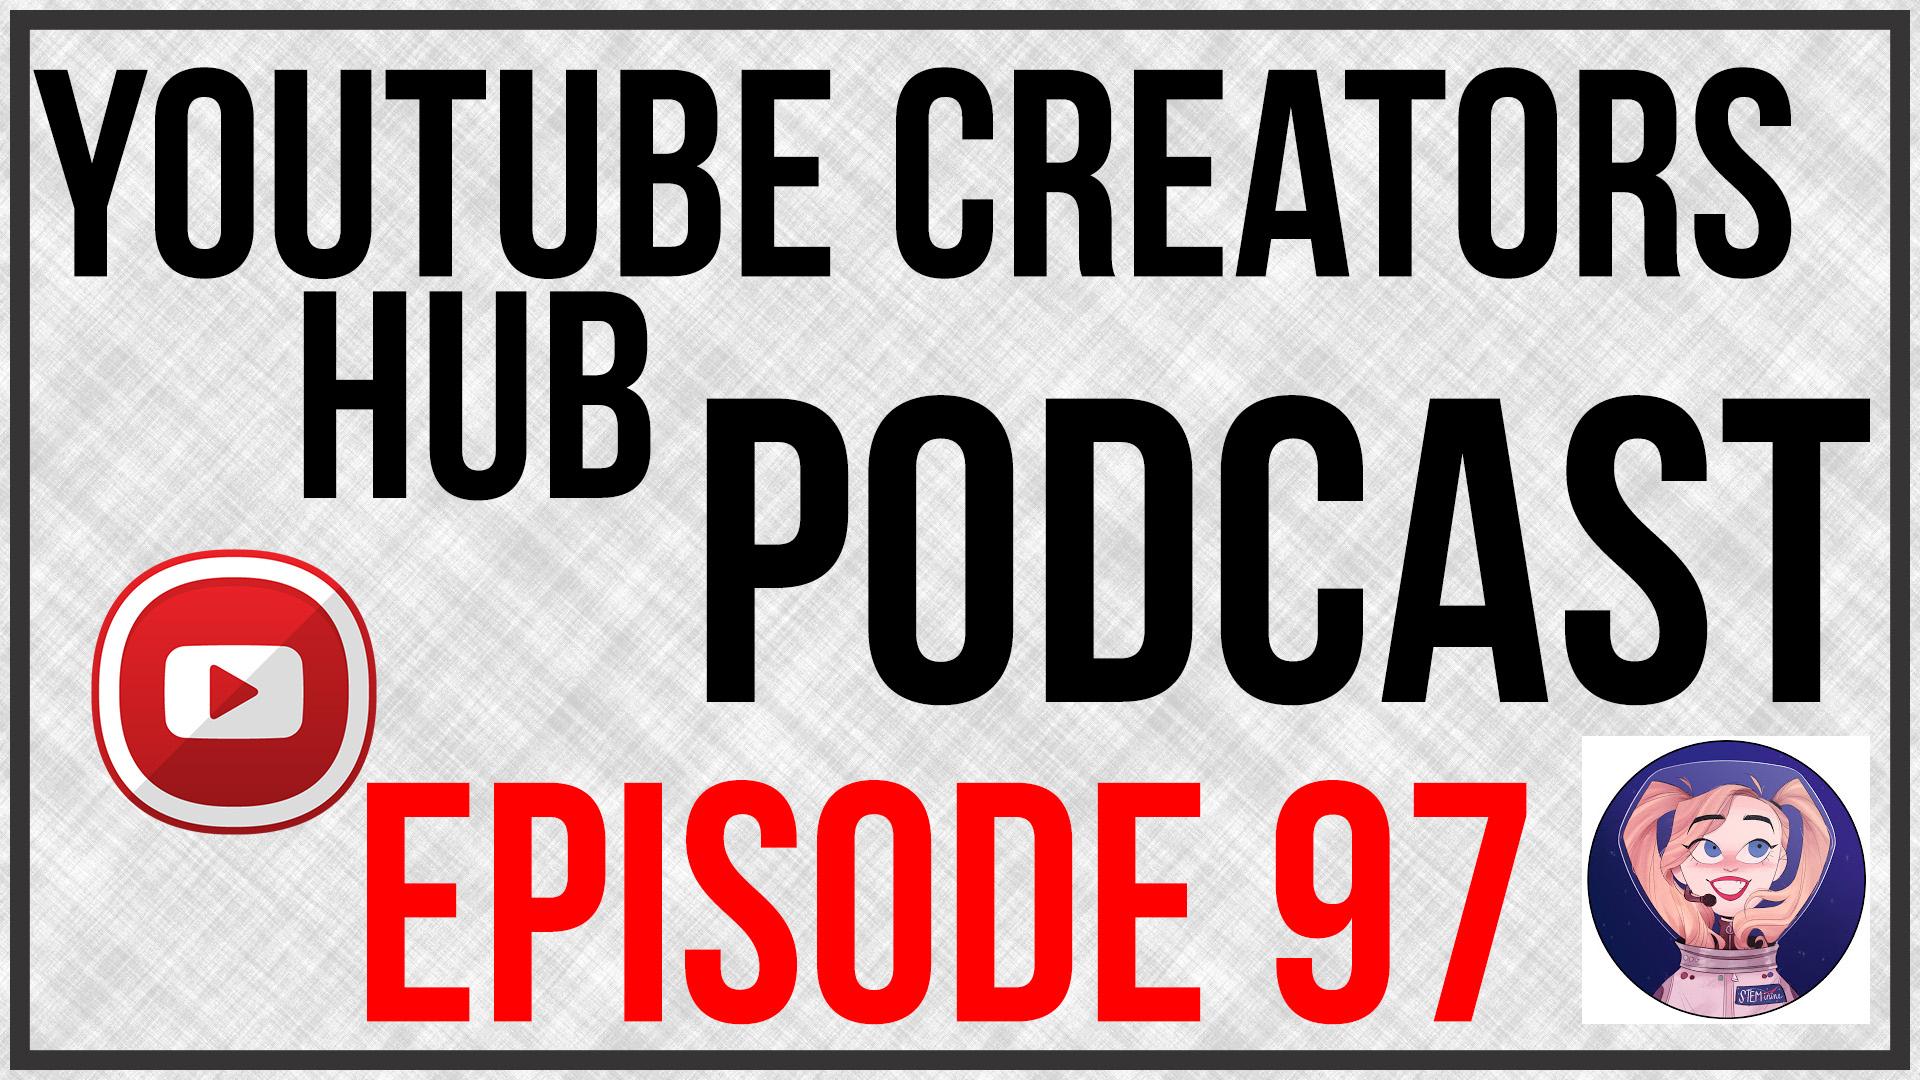 YouTube Creators Hub Podcast Episode 97